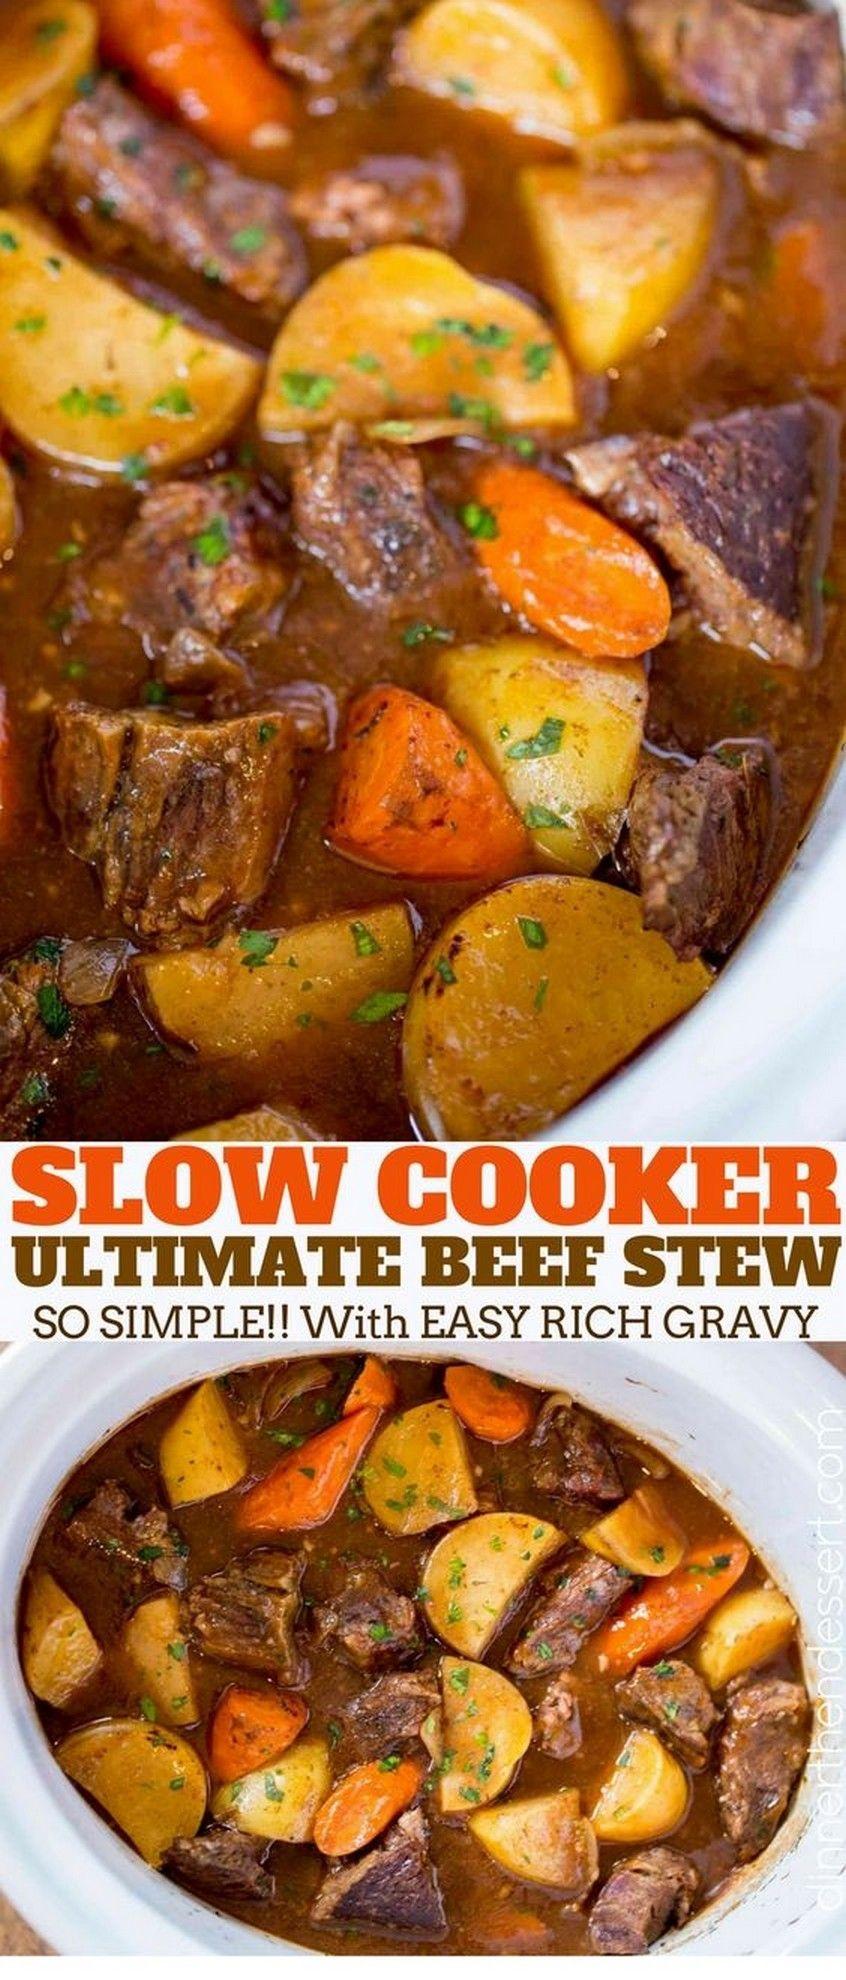 Ultimate Slow Cooker Beef Stew Recipe Crockpot Recipes Beef Stew Beef Stew Dinner Slow Cooker Beef Stew